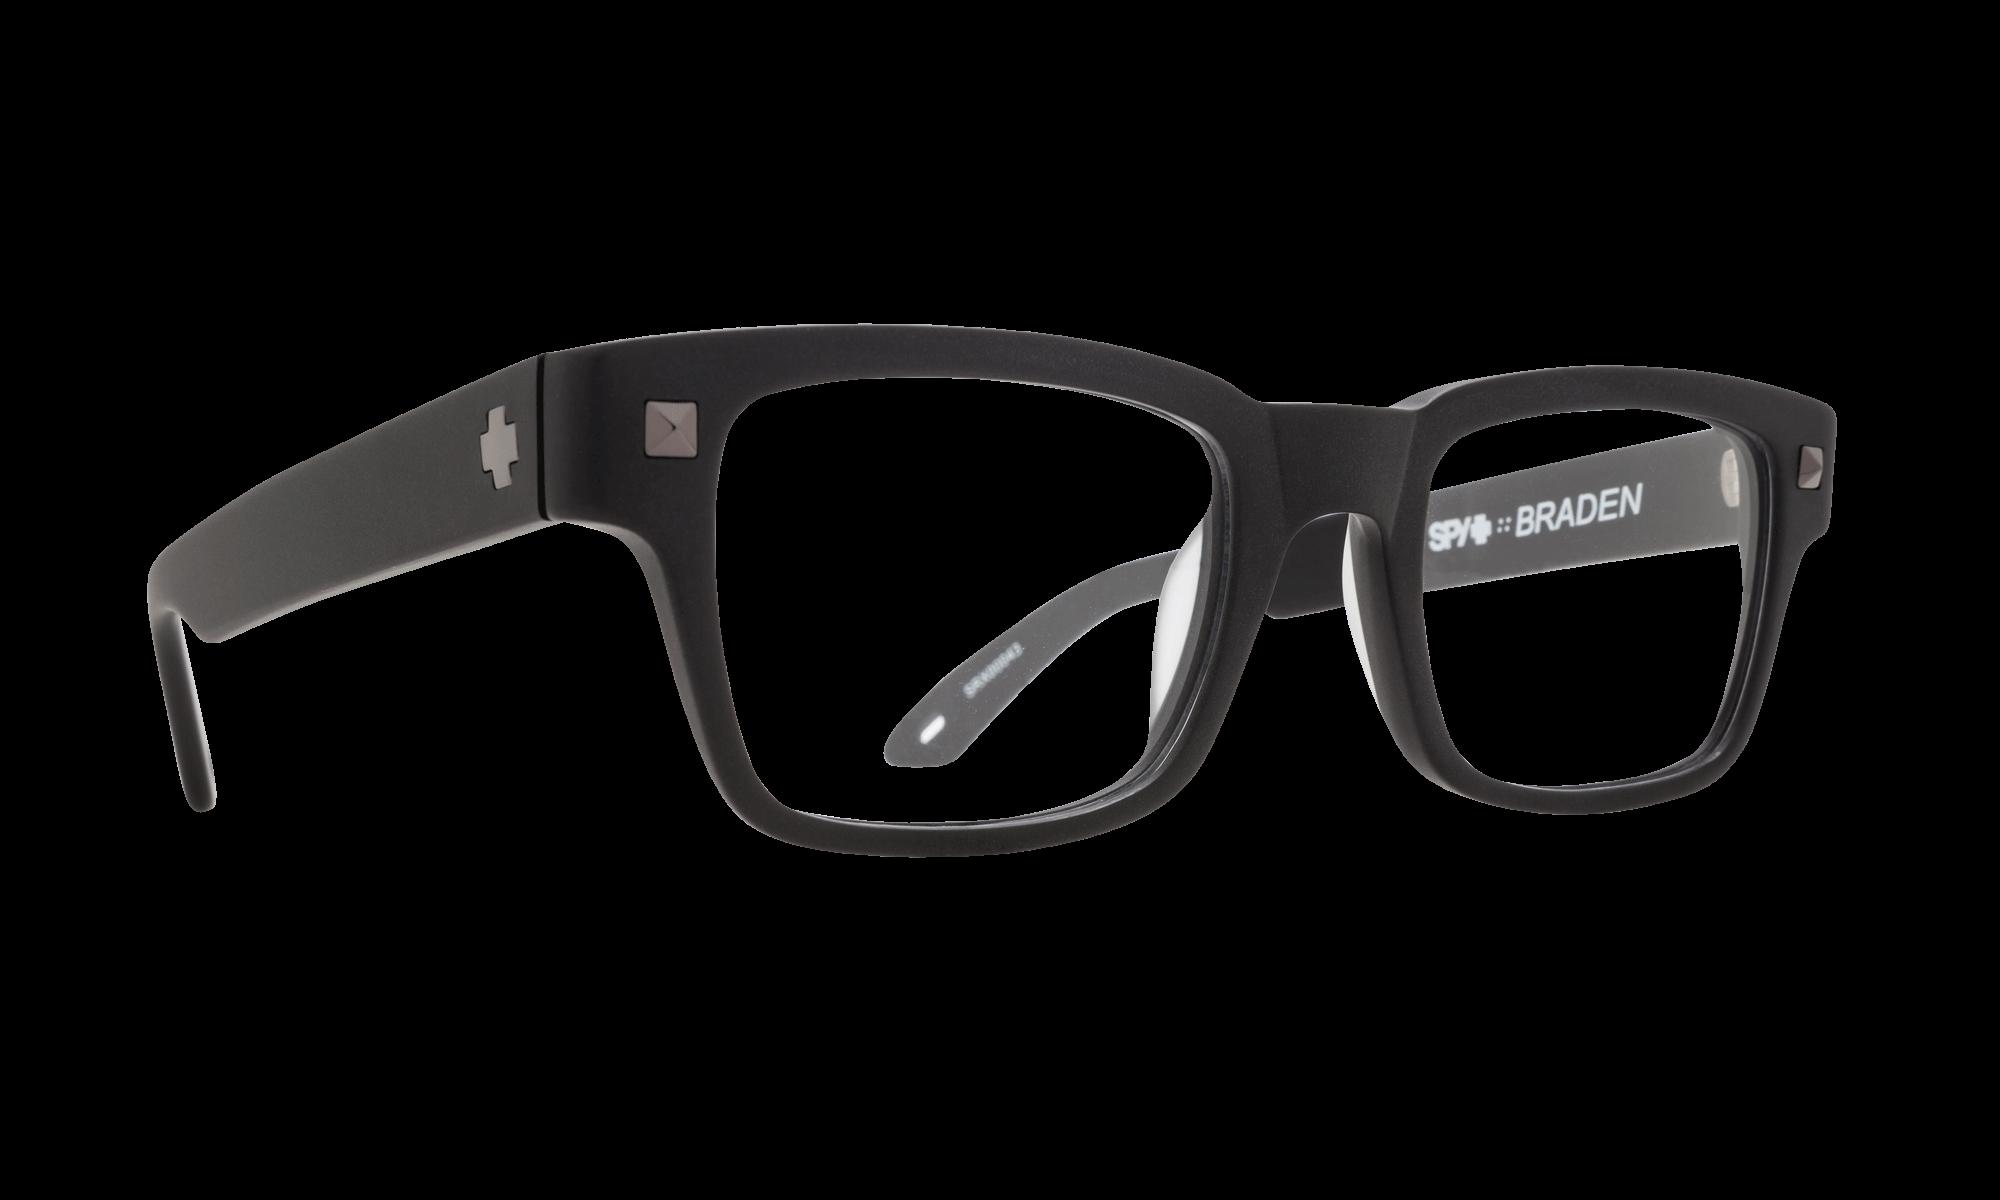 24840a727688 Spy Optic Braden Progressive Prescription Eyeglasses FREE S H SRX00043PR. Spy  Optic Eyeglasses.